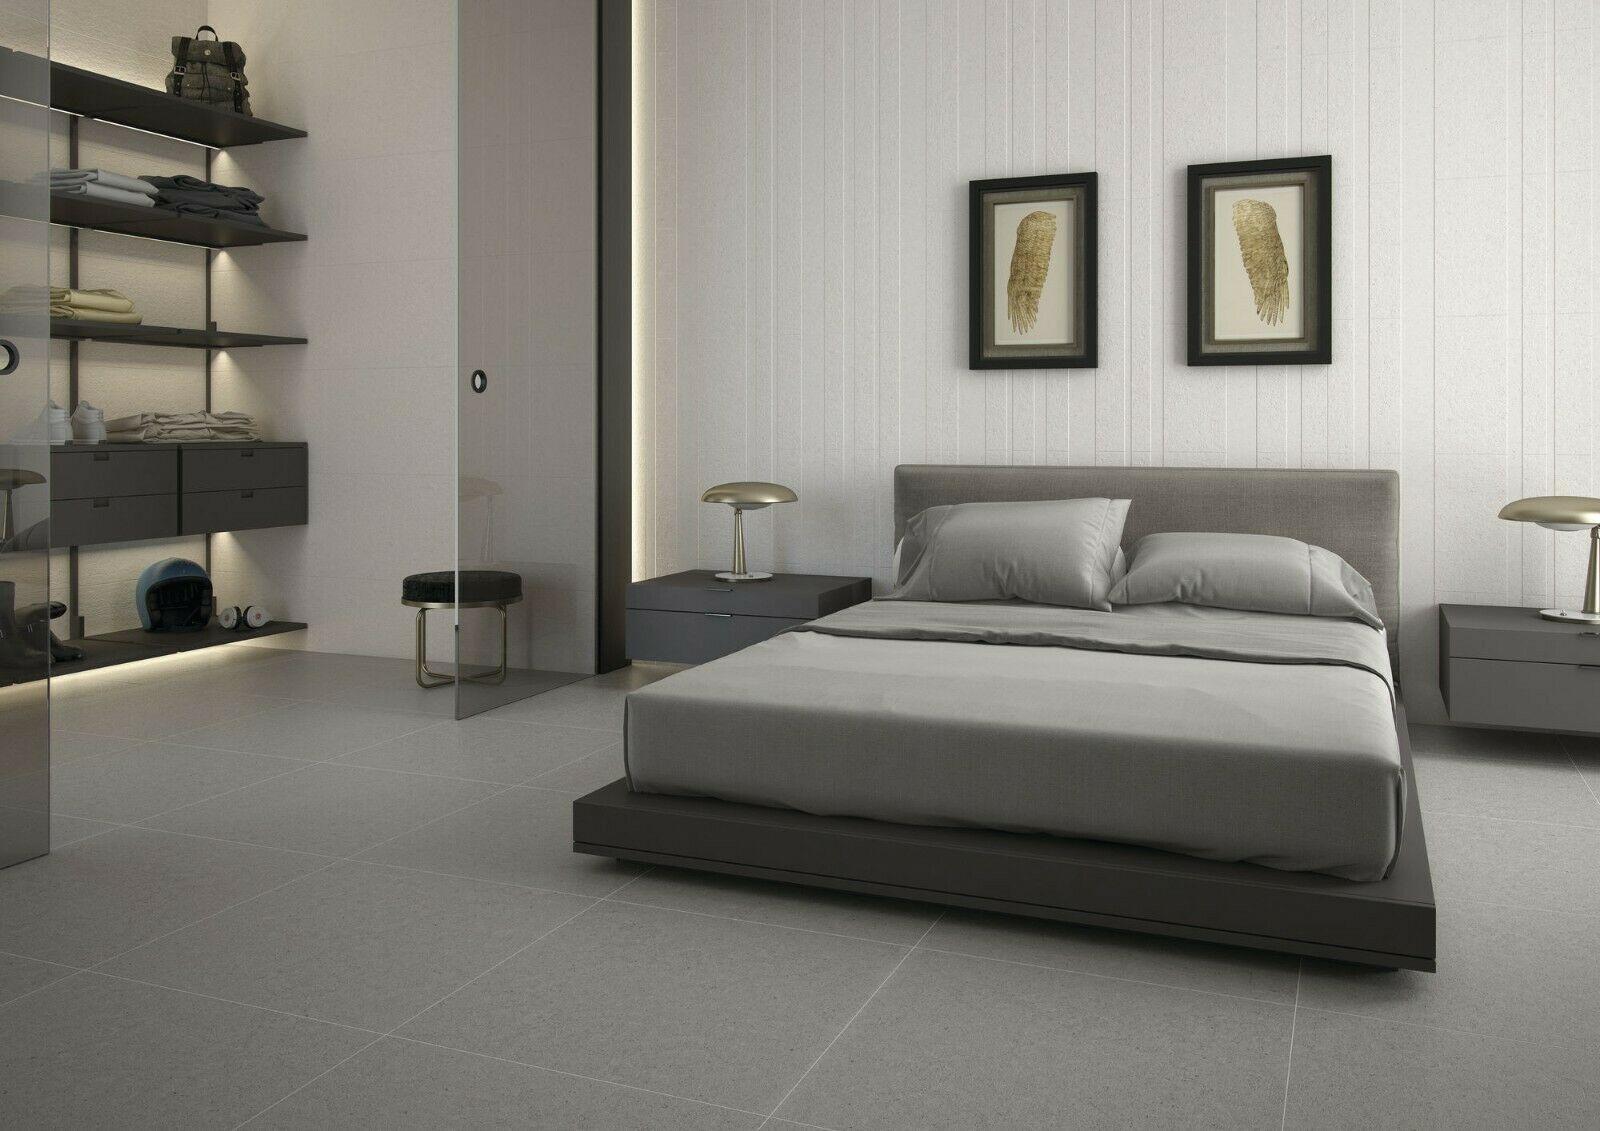 3150 Sqft 30x30 Porcelain Tile Spain Cifre Ceramica Limestone Pearl In 2020 House Interior Bedroom Interior Bedroom Design